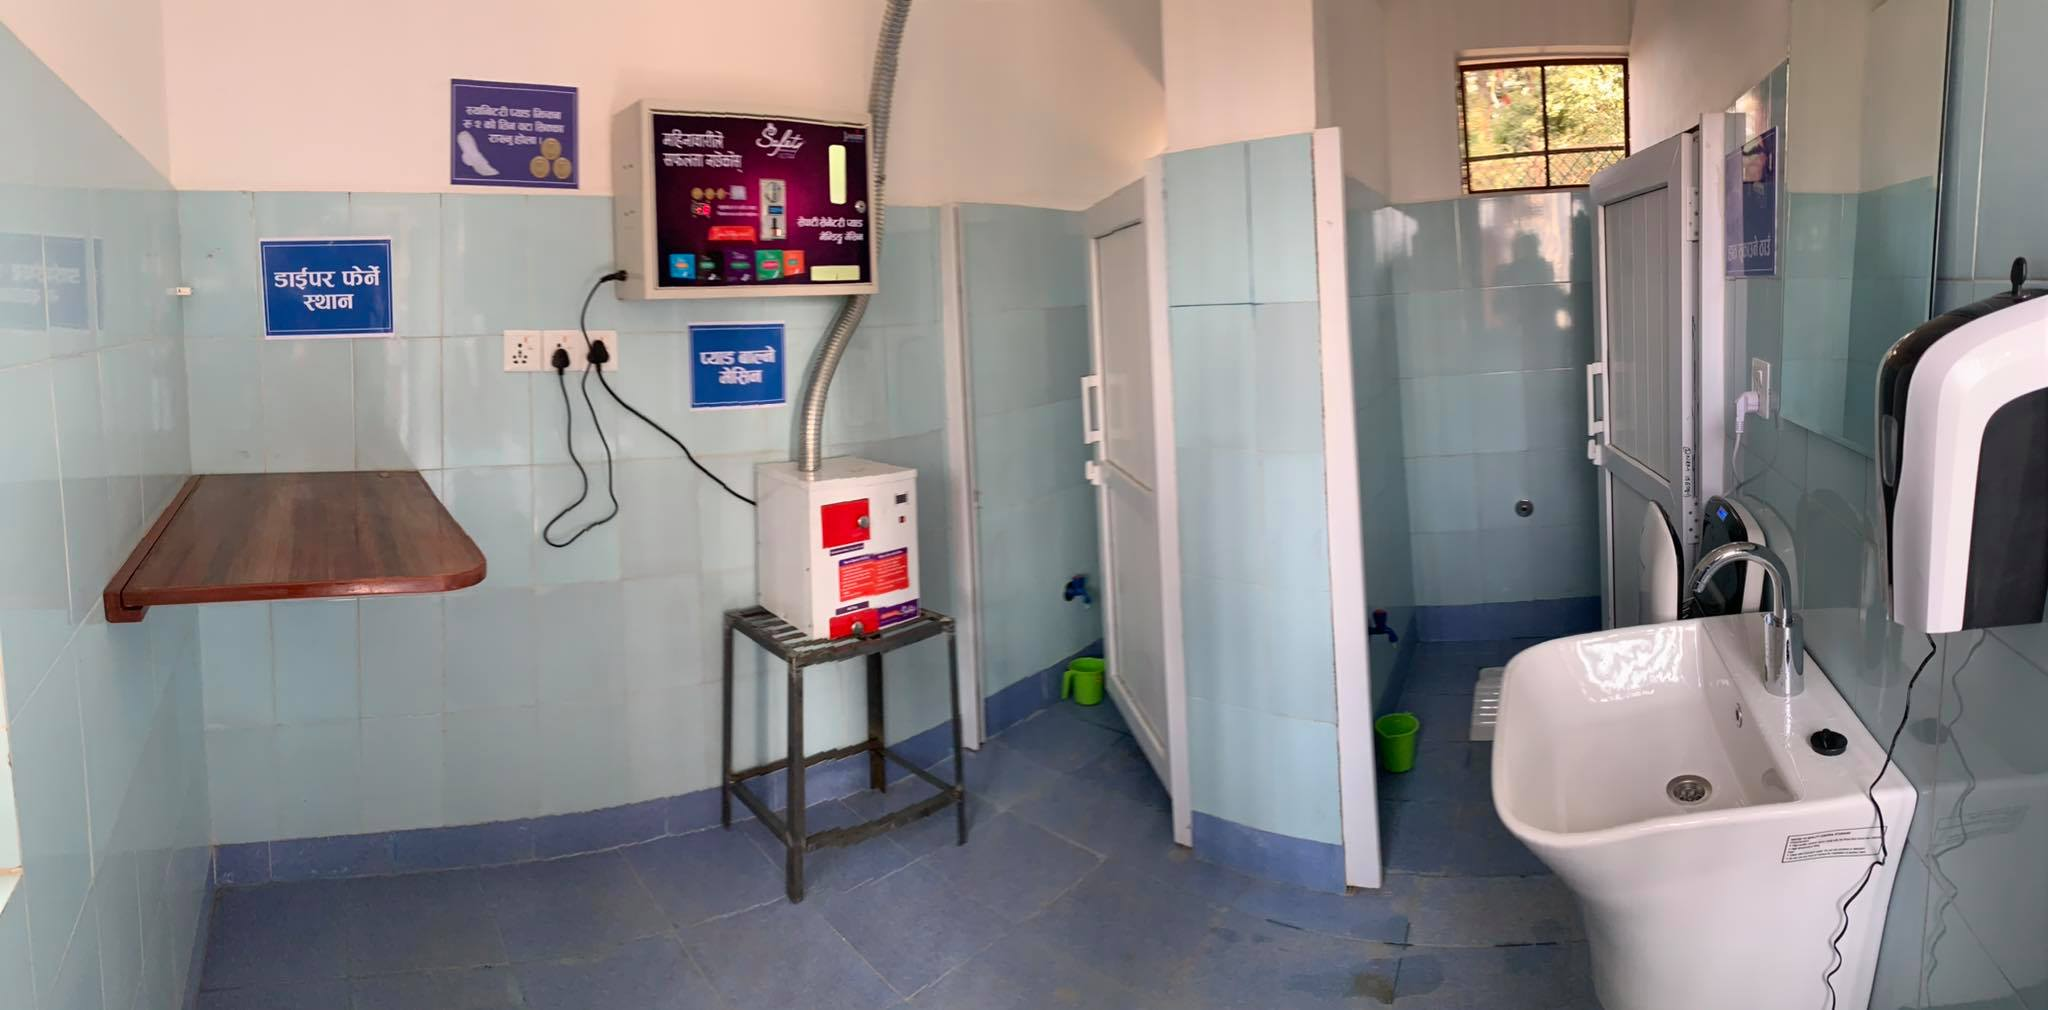 Picture of interior of Aerosan toilet in Kathmandu, Nepal